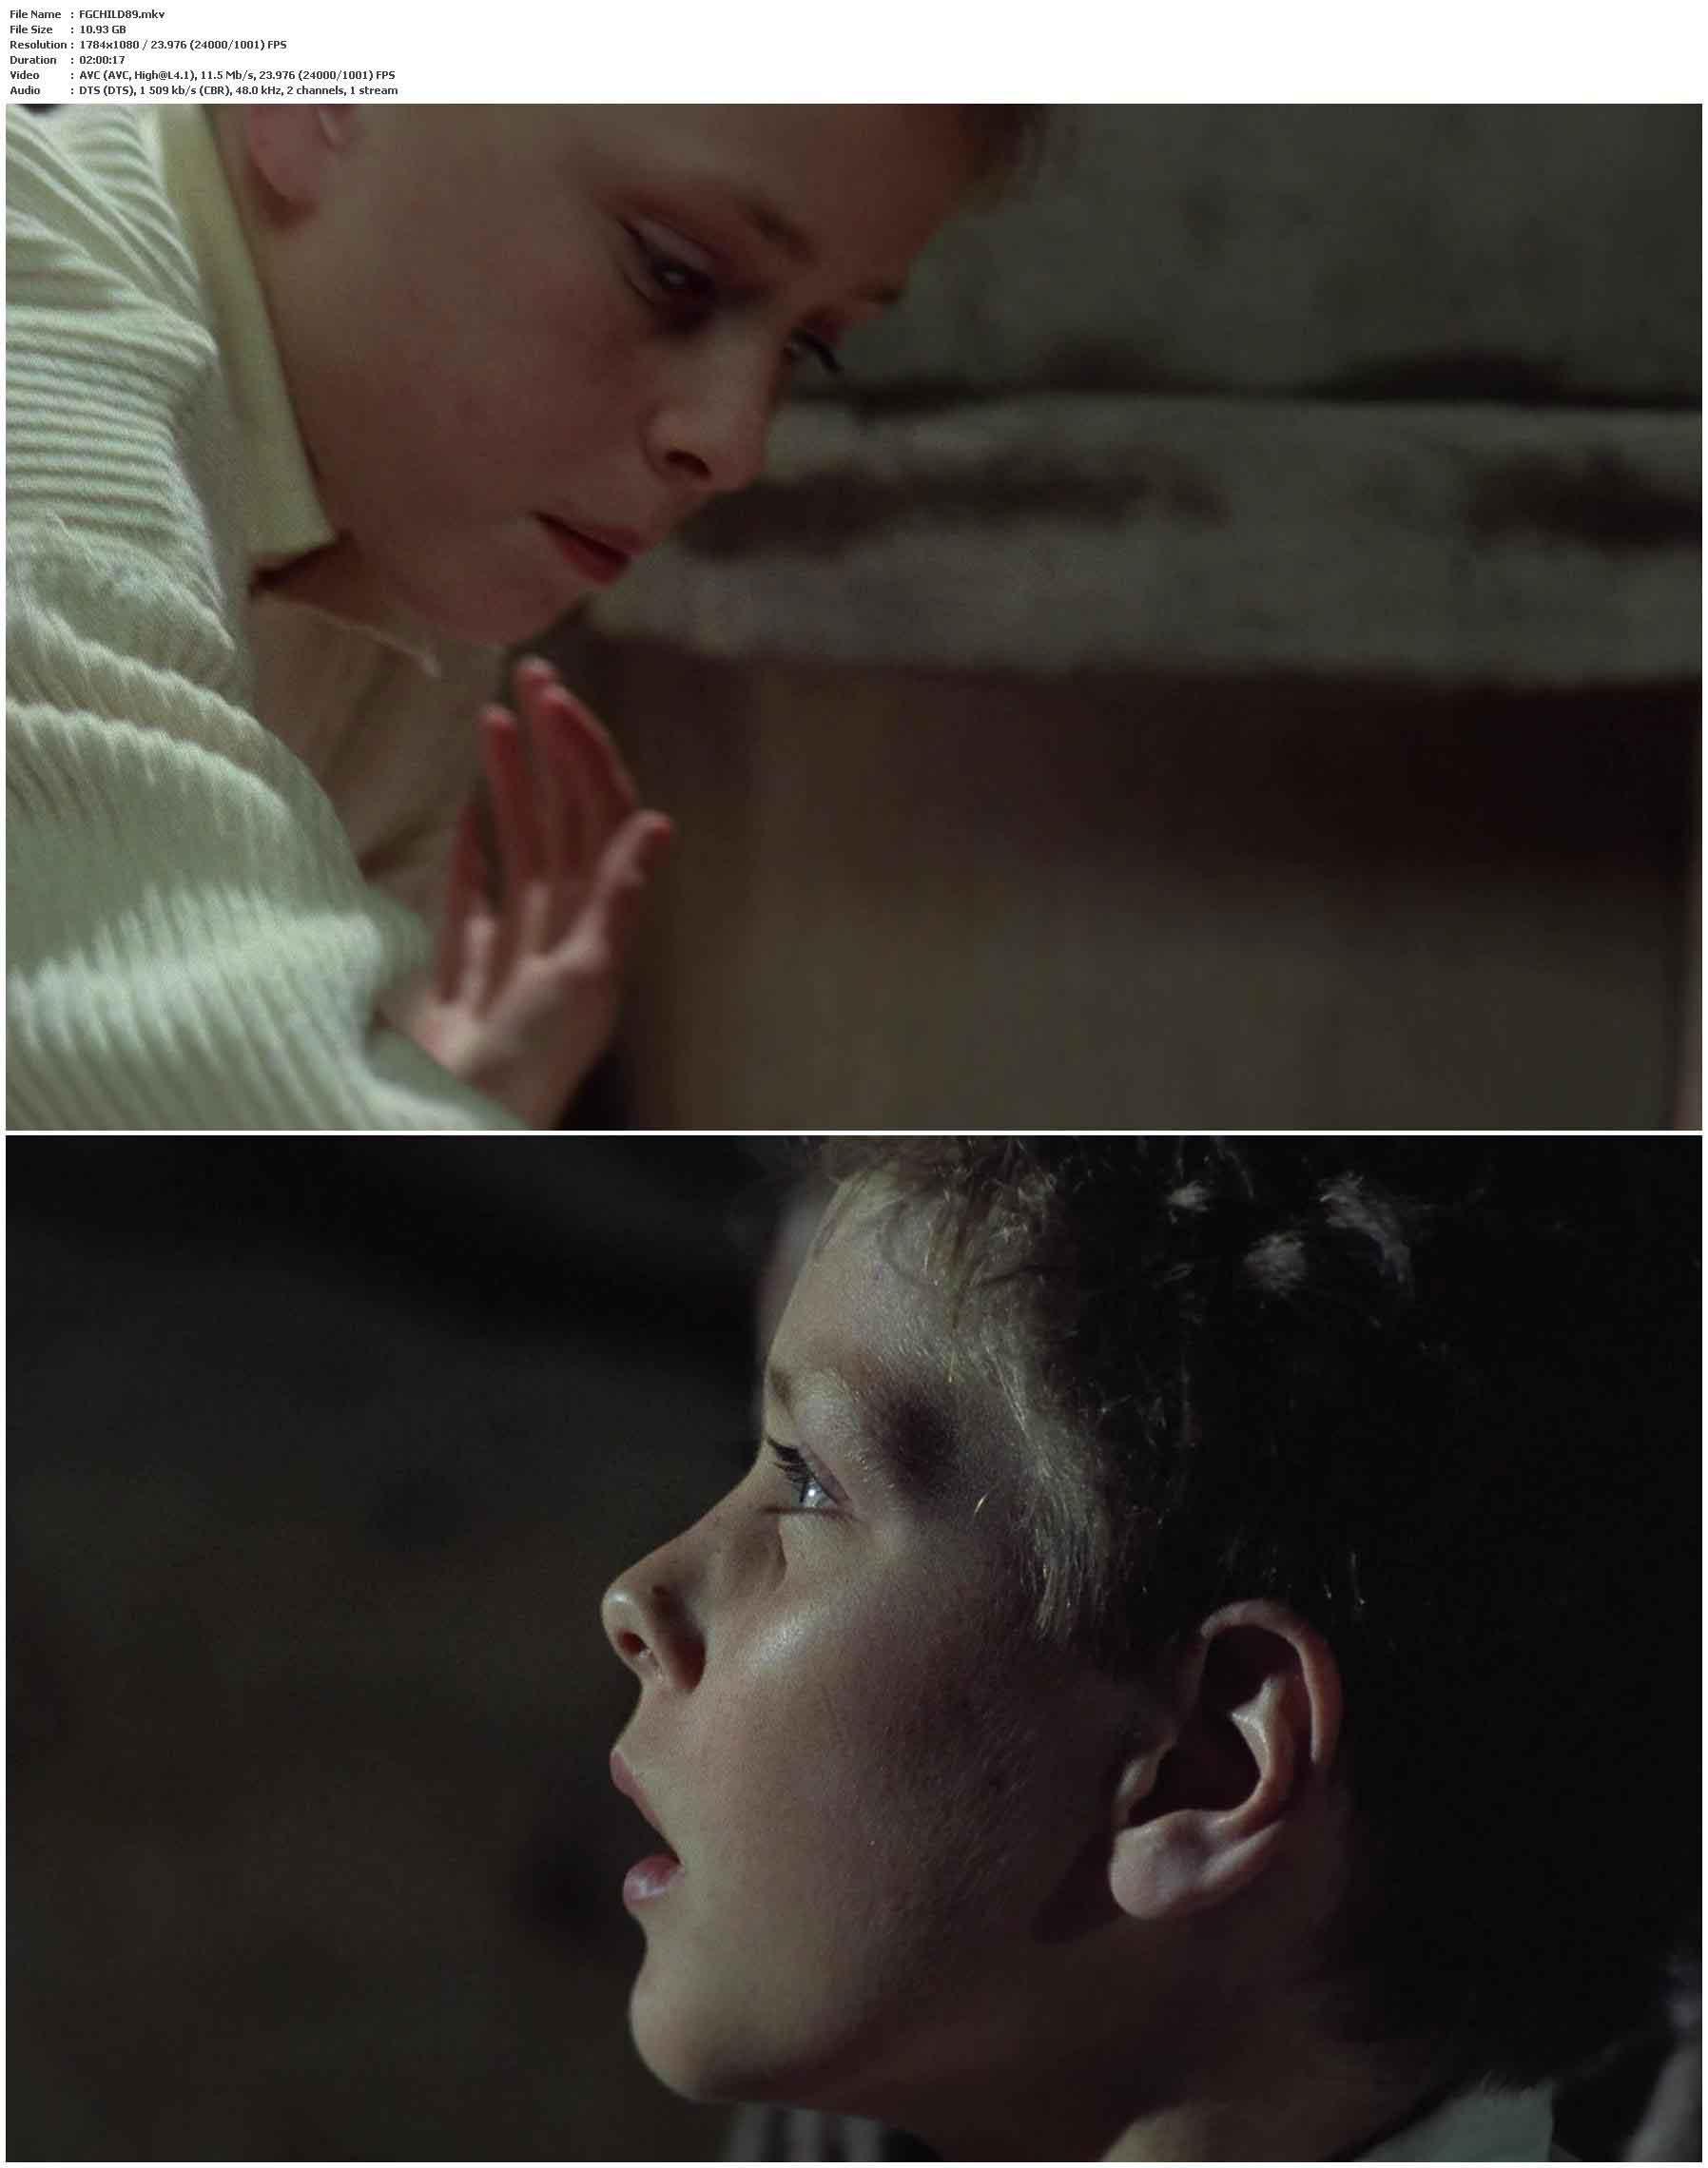 Moon Child (1989)